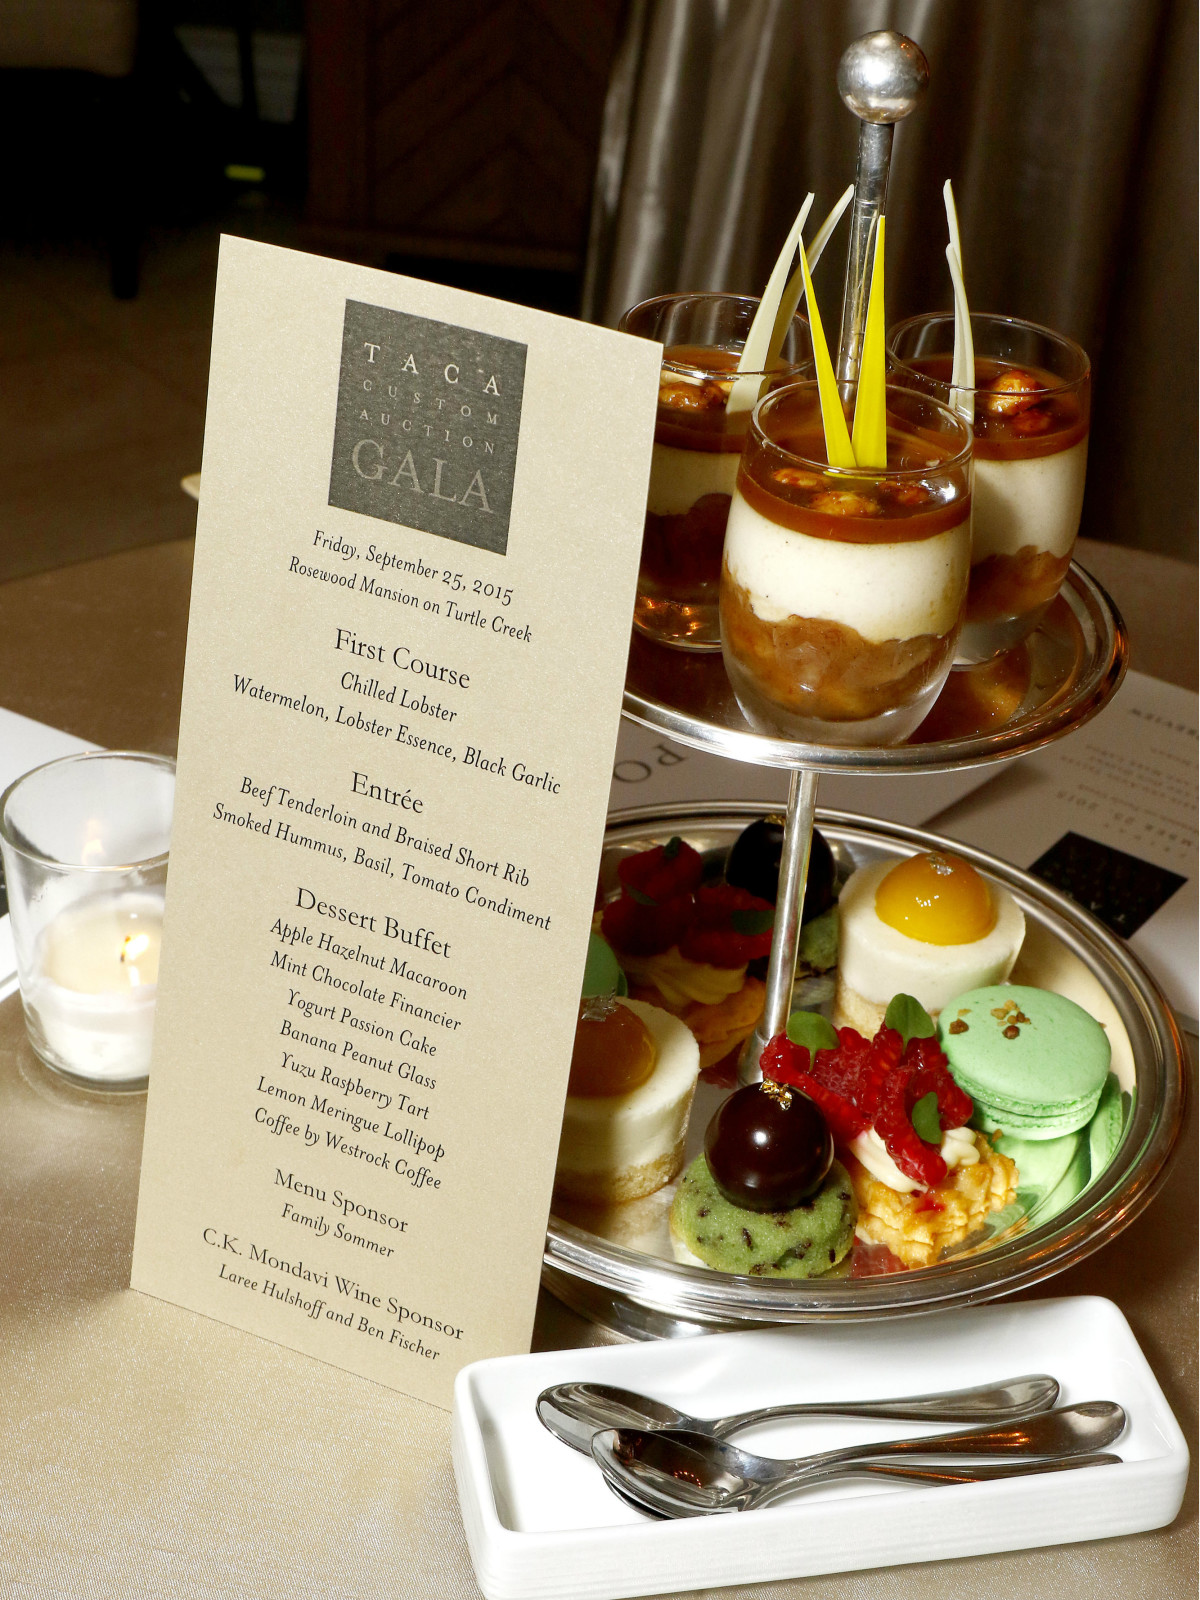 Menu and Assorted Desserts